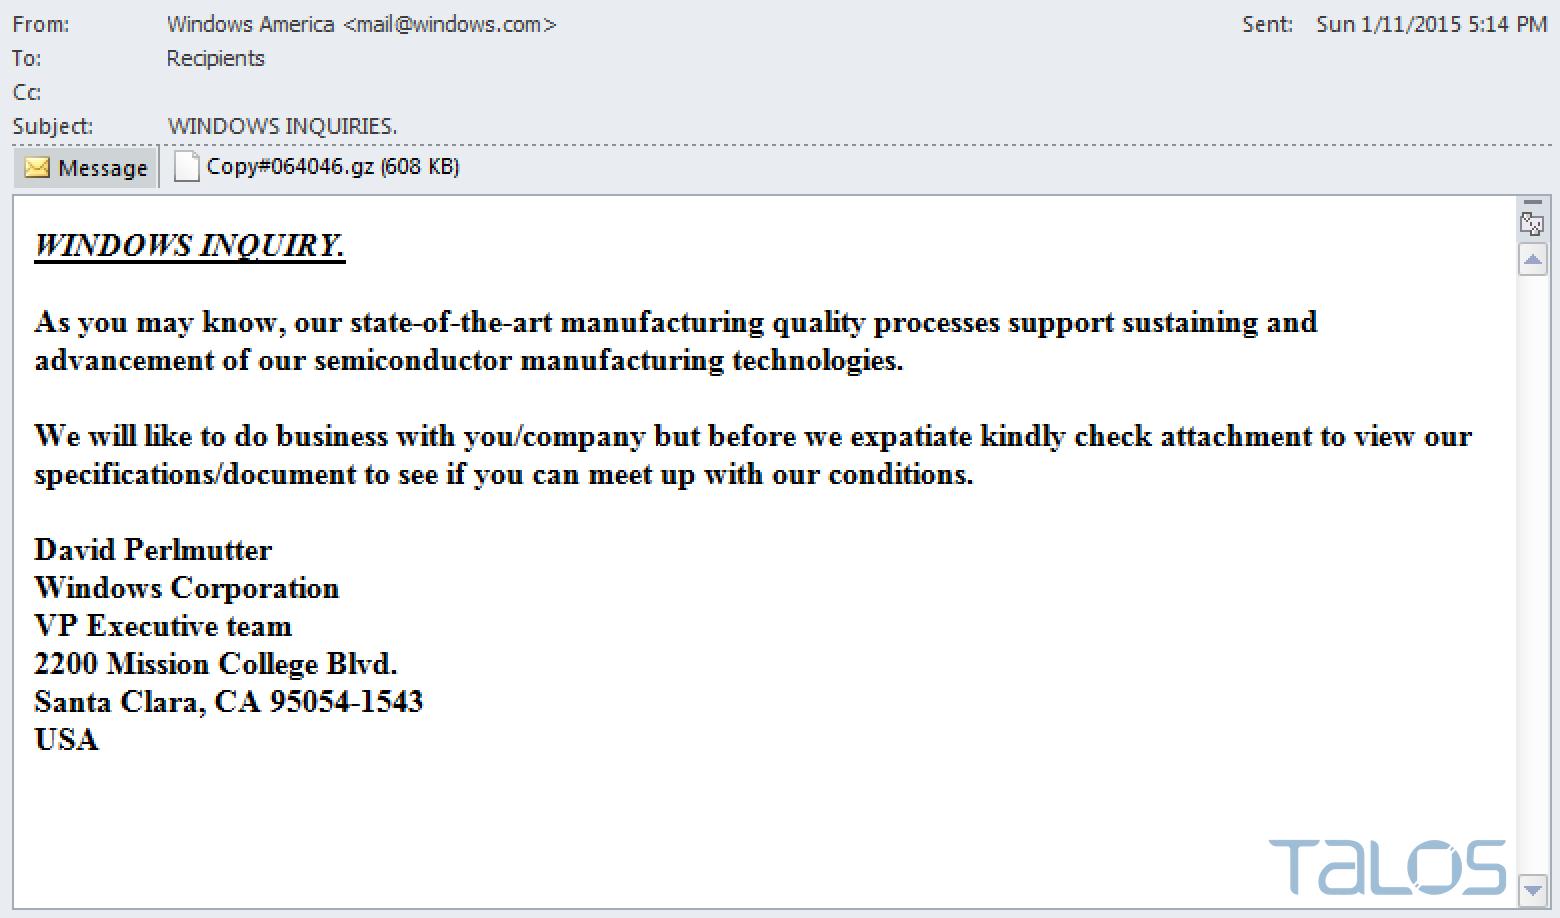 hsbc checking account application status